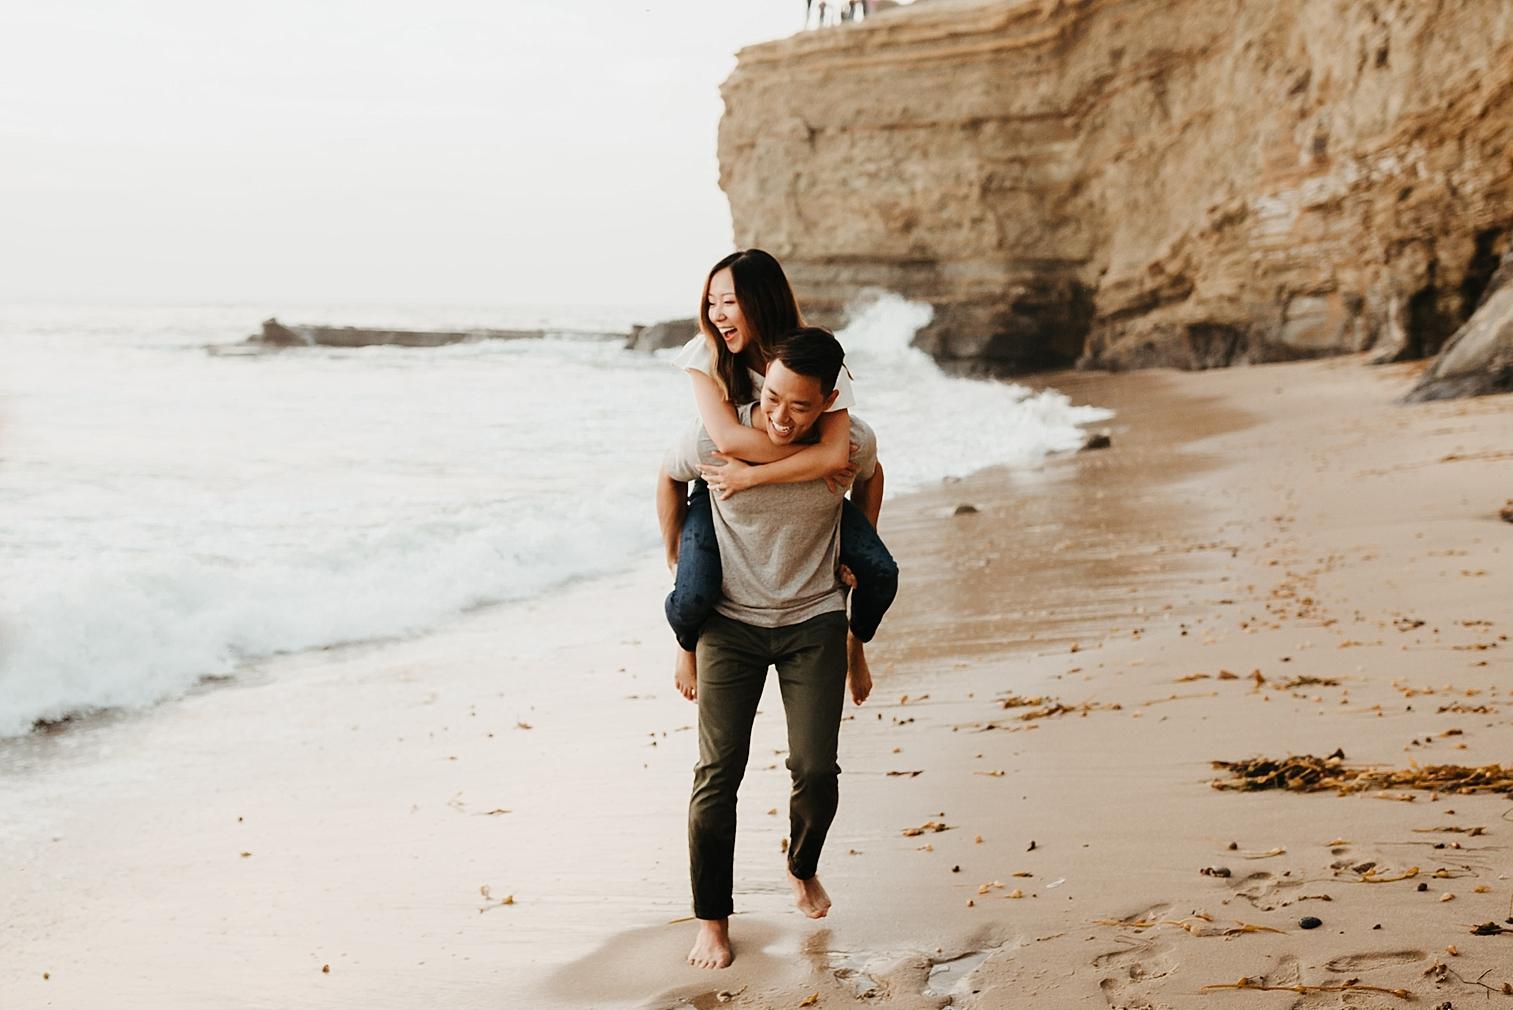 San-Diego-Ocean-Beach-Engagement-Session-52.jpg